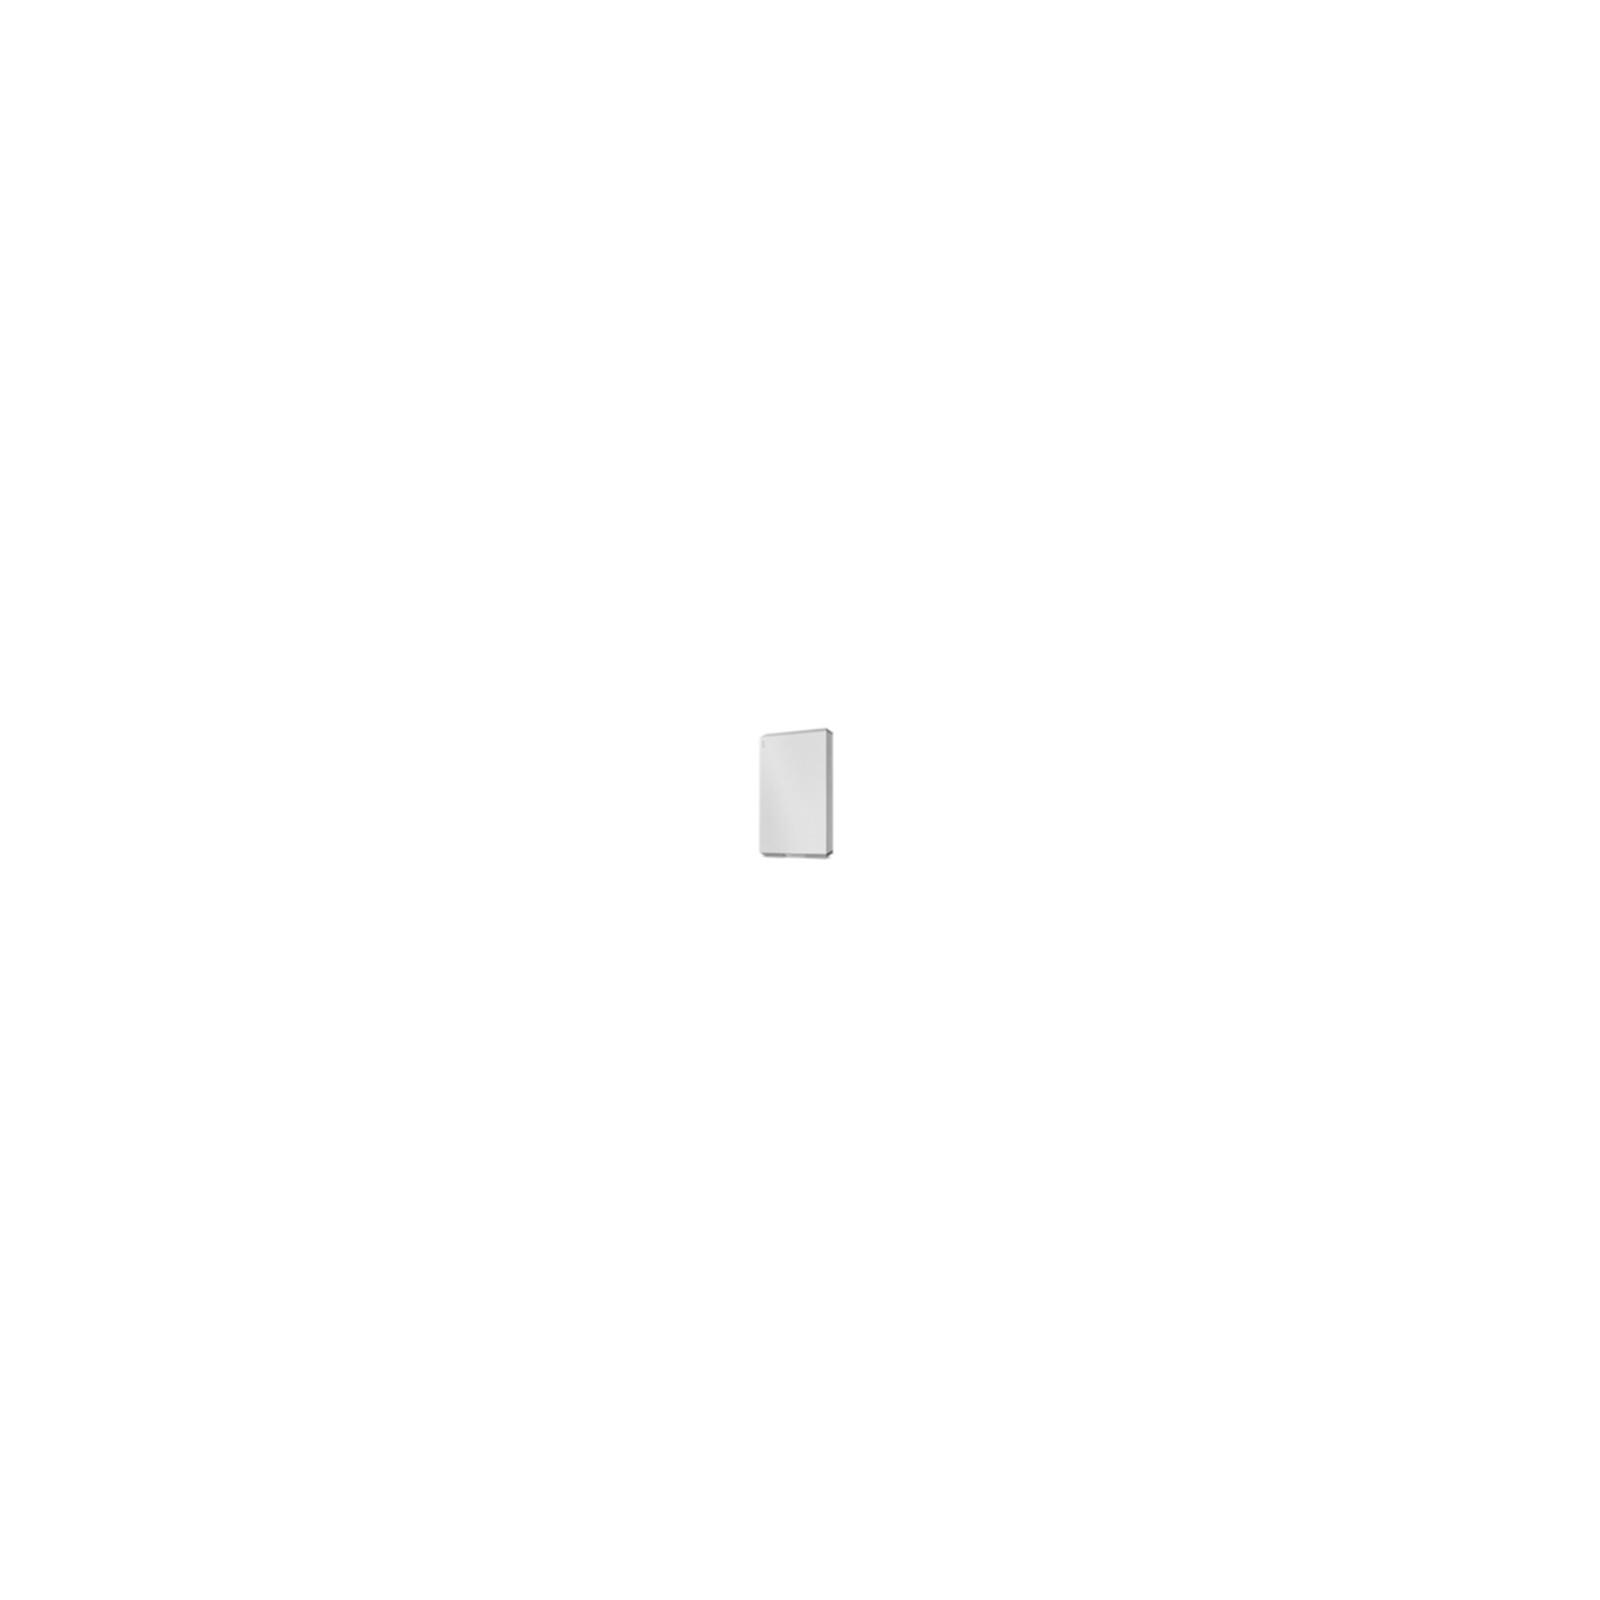 "LaCie Mobile Drive 5TB, 2.5"" USB C"